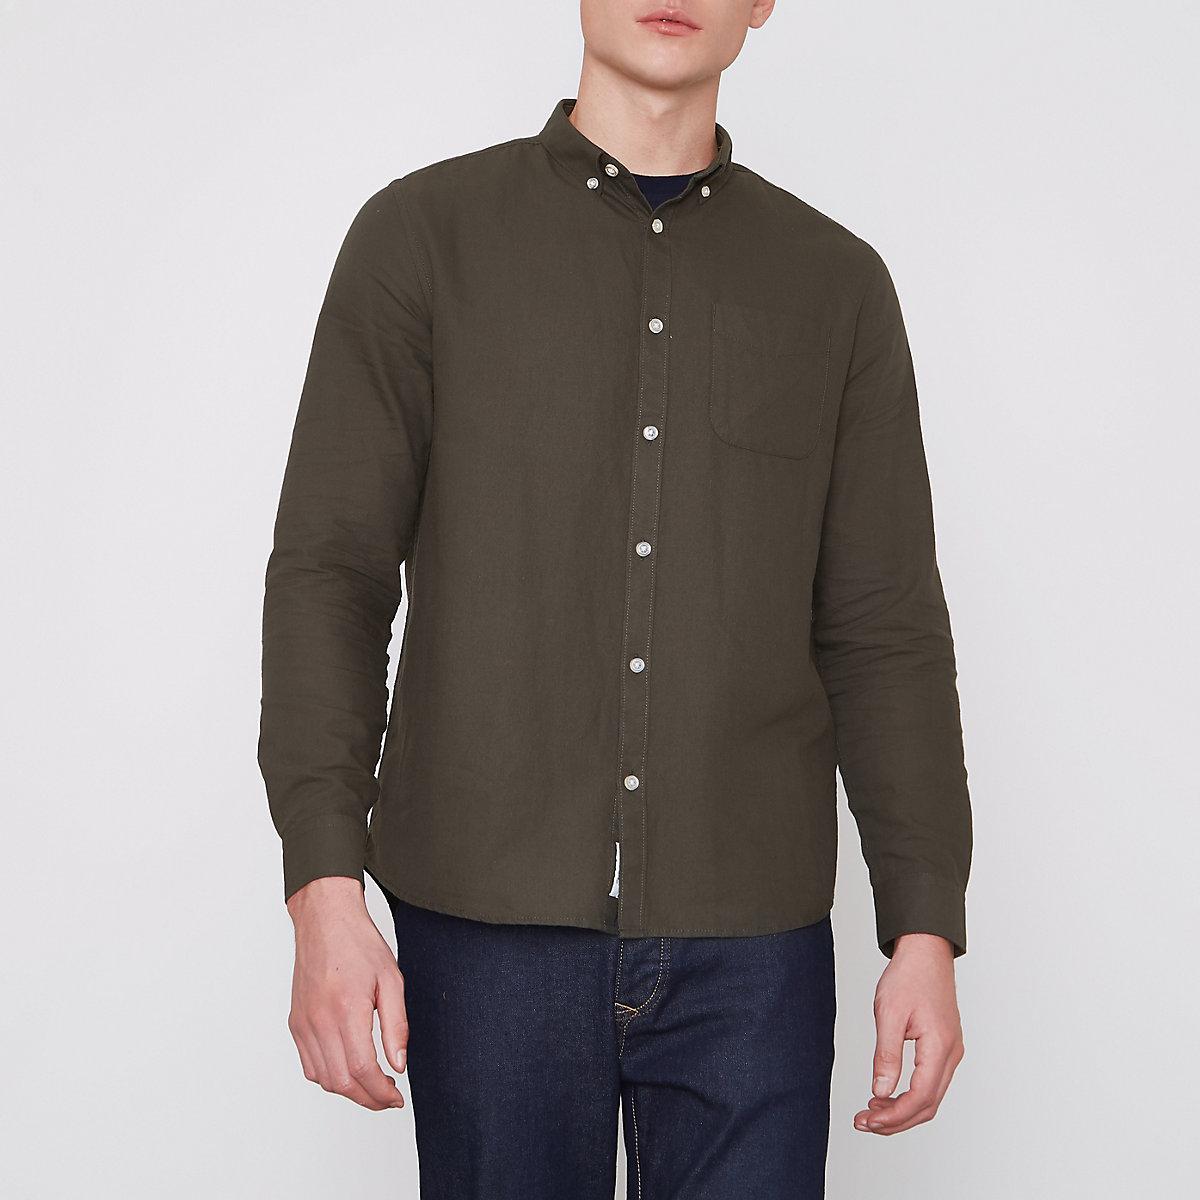 Khaki green long sleeve Oxford shirt